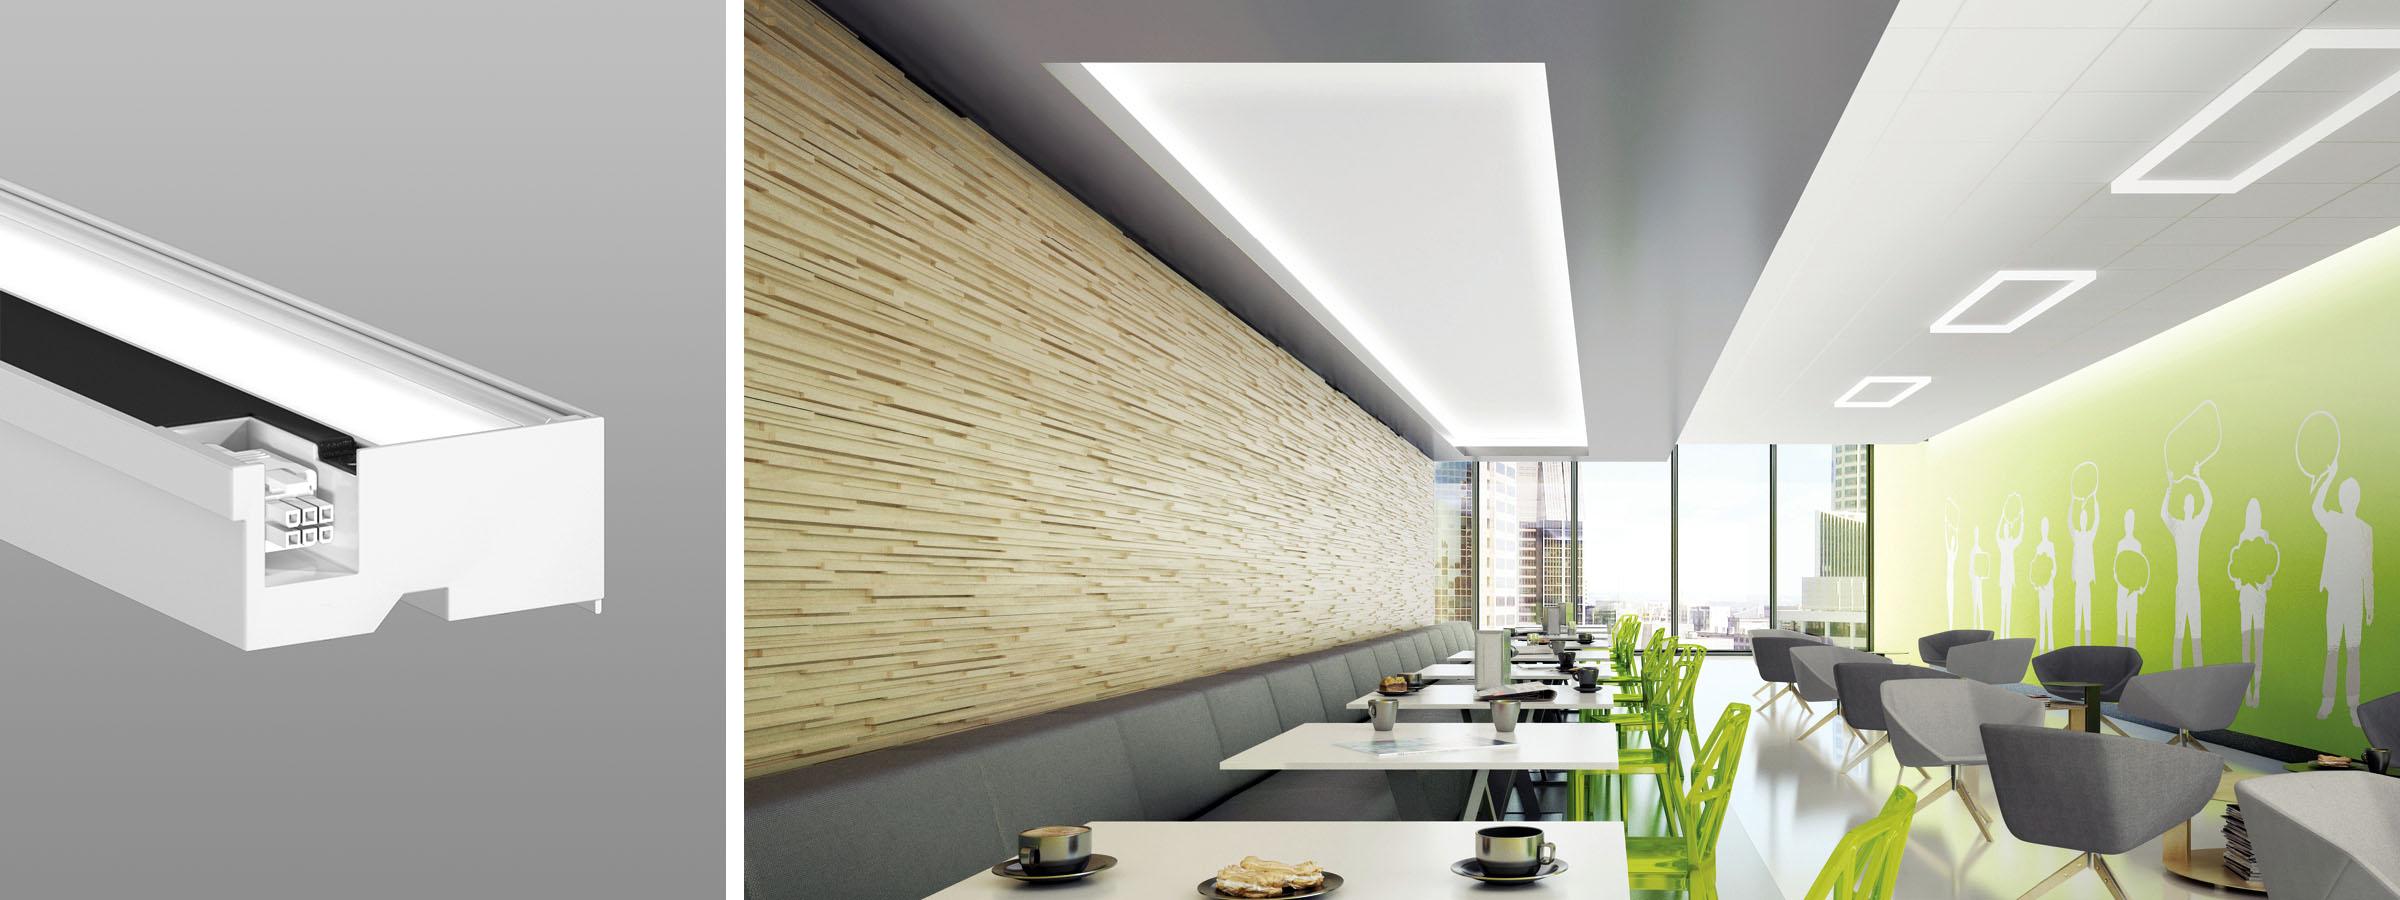 Cove ceiling render cafeteria HERO